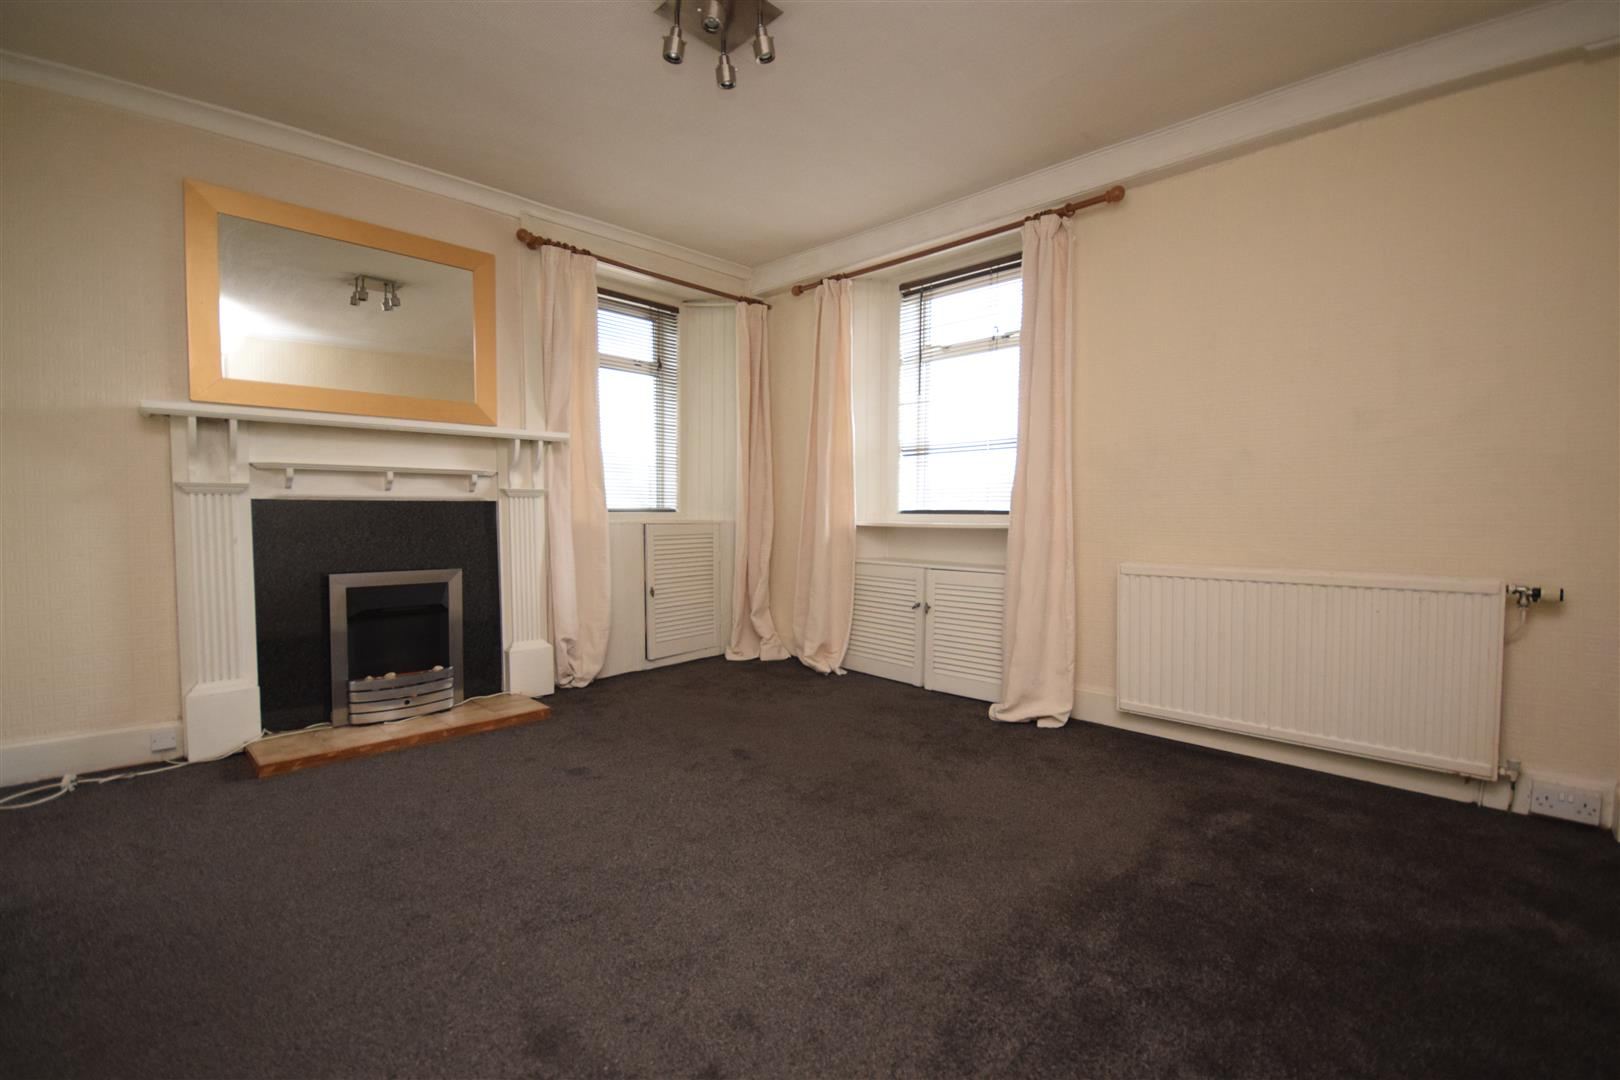 Cameron Place, 68, Dundee Road, Perth, Perthshire, PH2 7BA, UK